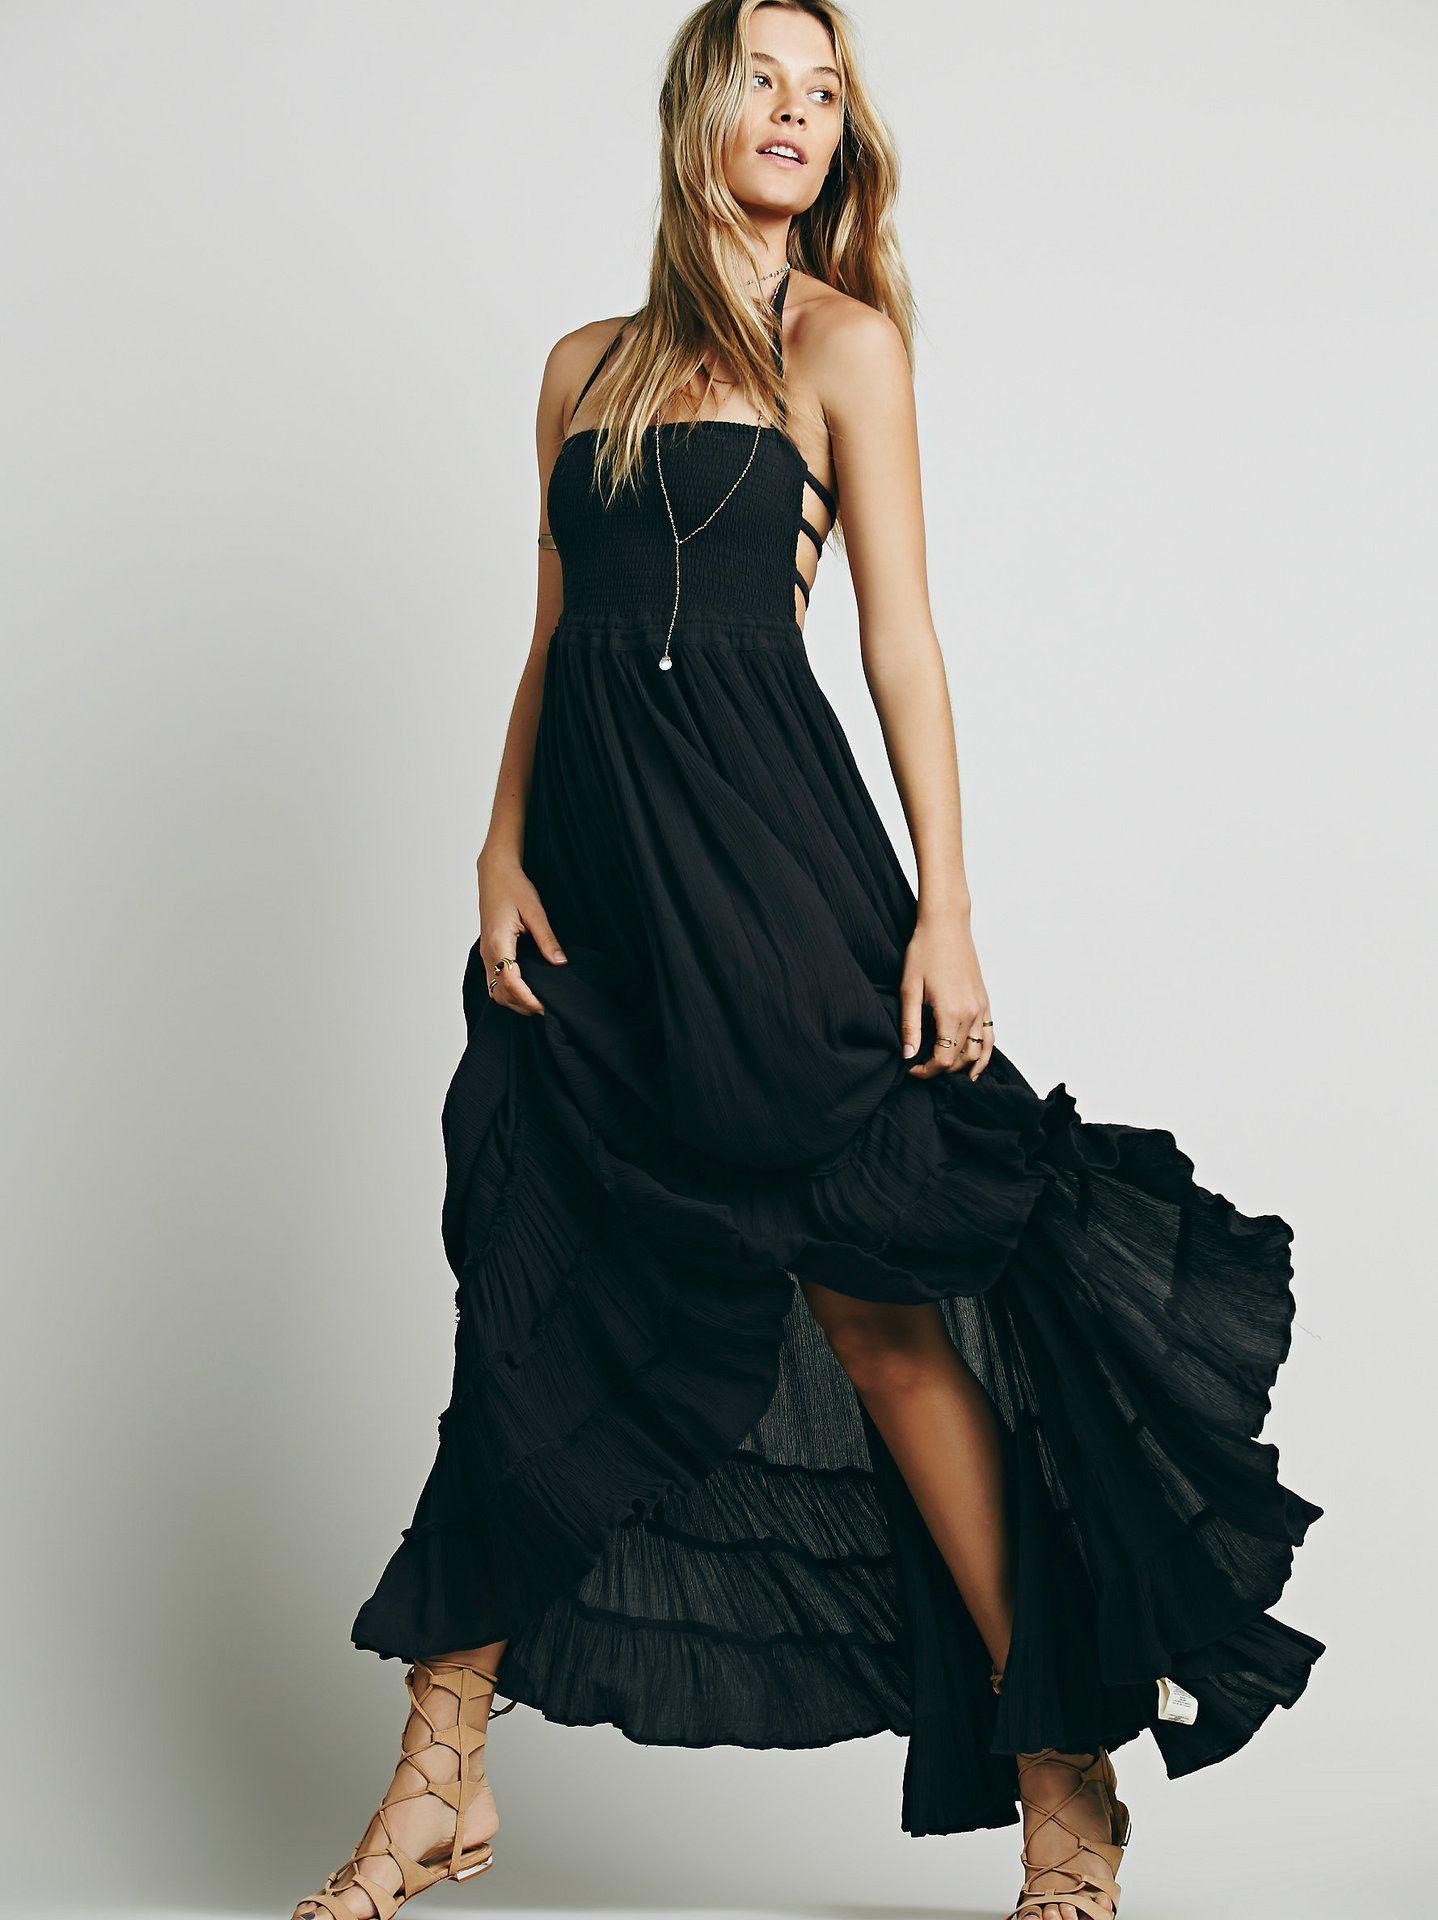 28a6f75e63 Backless Spaghetti Strap Sleeveless Long Beach Dress | Blue ...